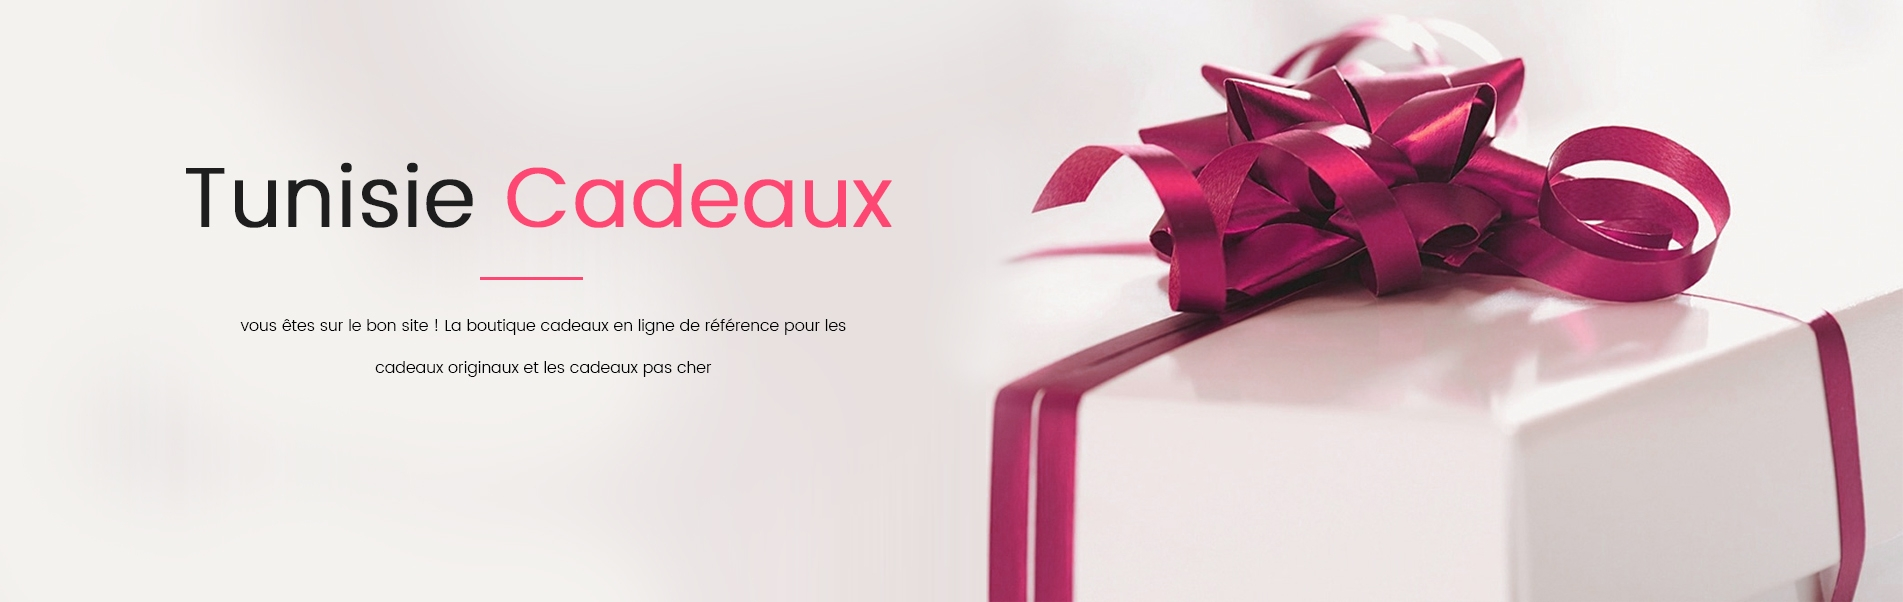 Tunisie Cadeaux